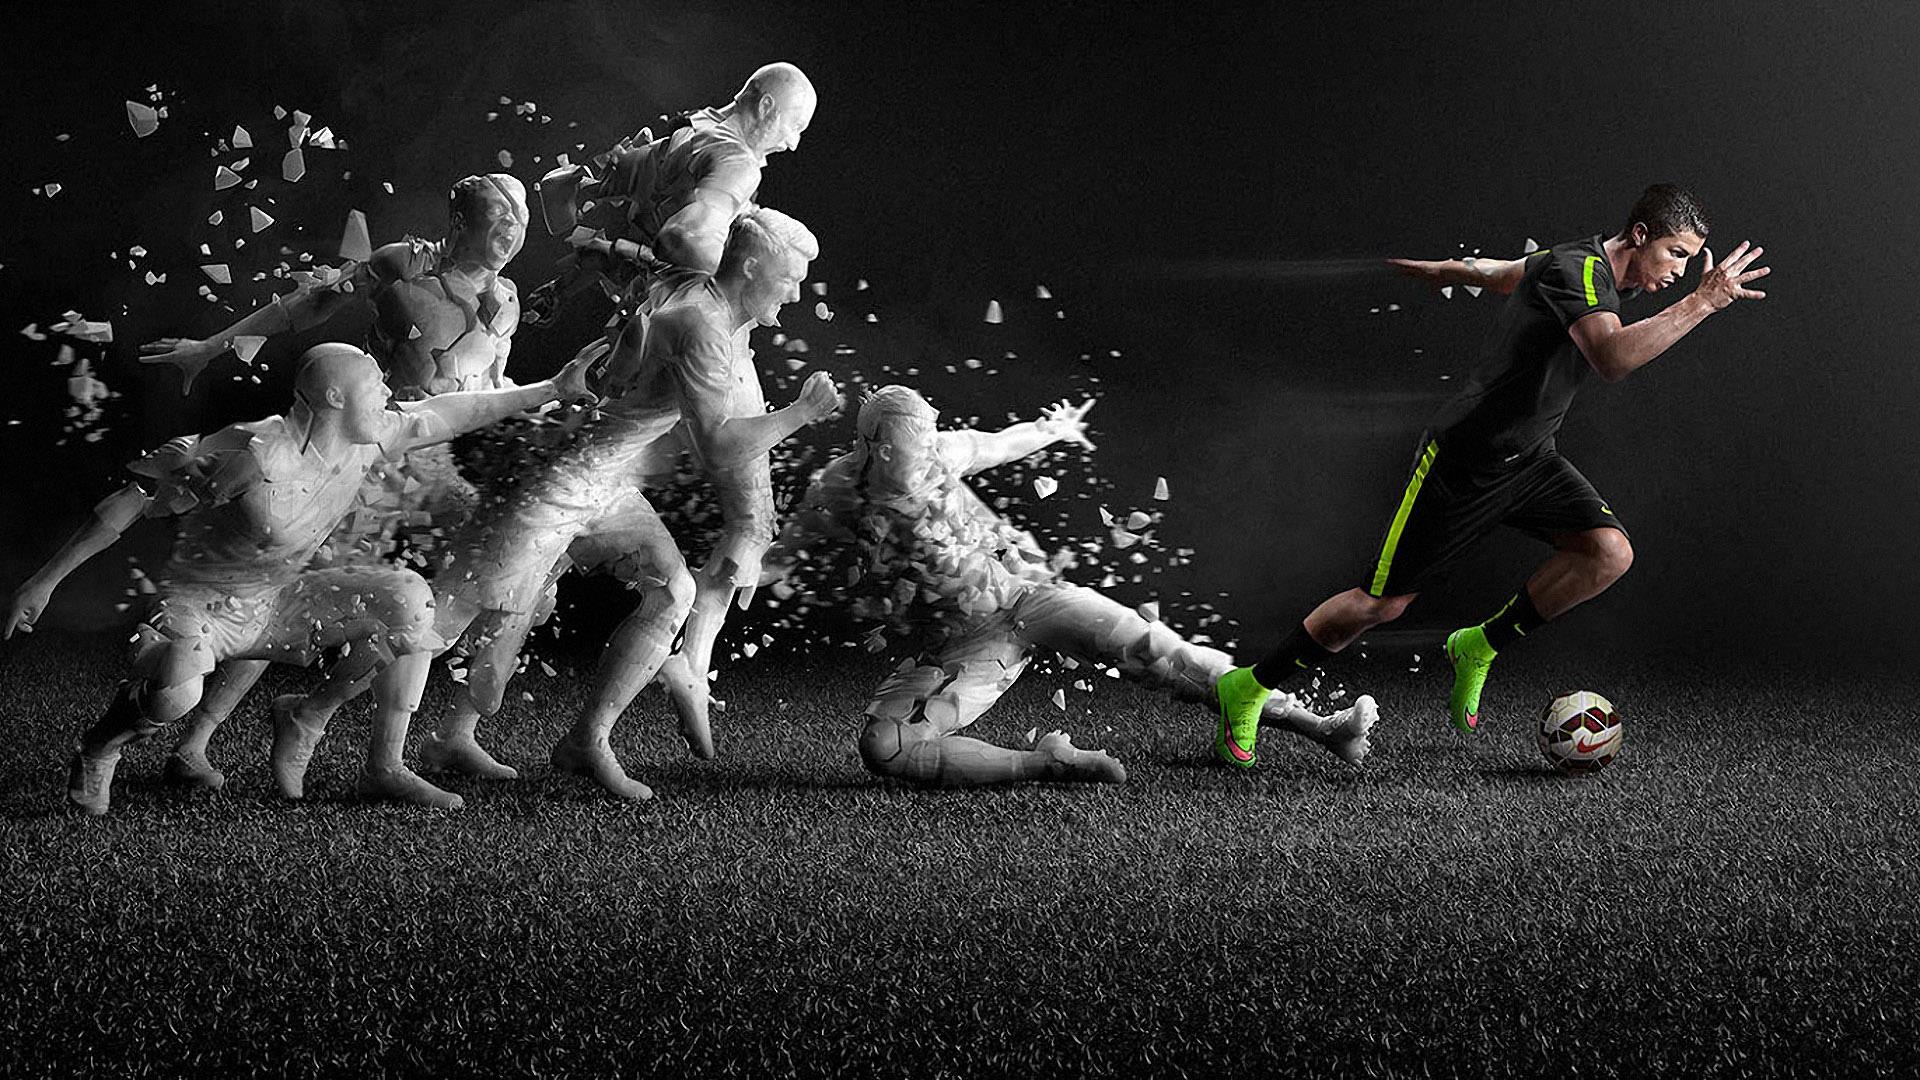 Ronaldo Nike Mercurial Wallpaper   Cristiano Ronaldo Wallpapers 1920x1080